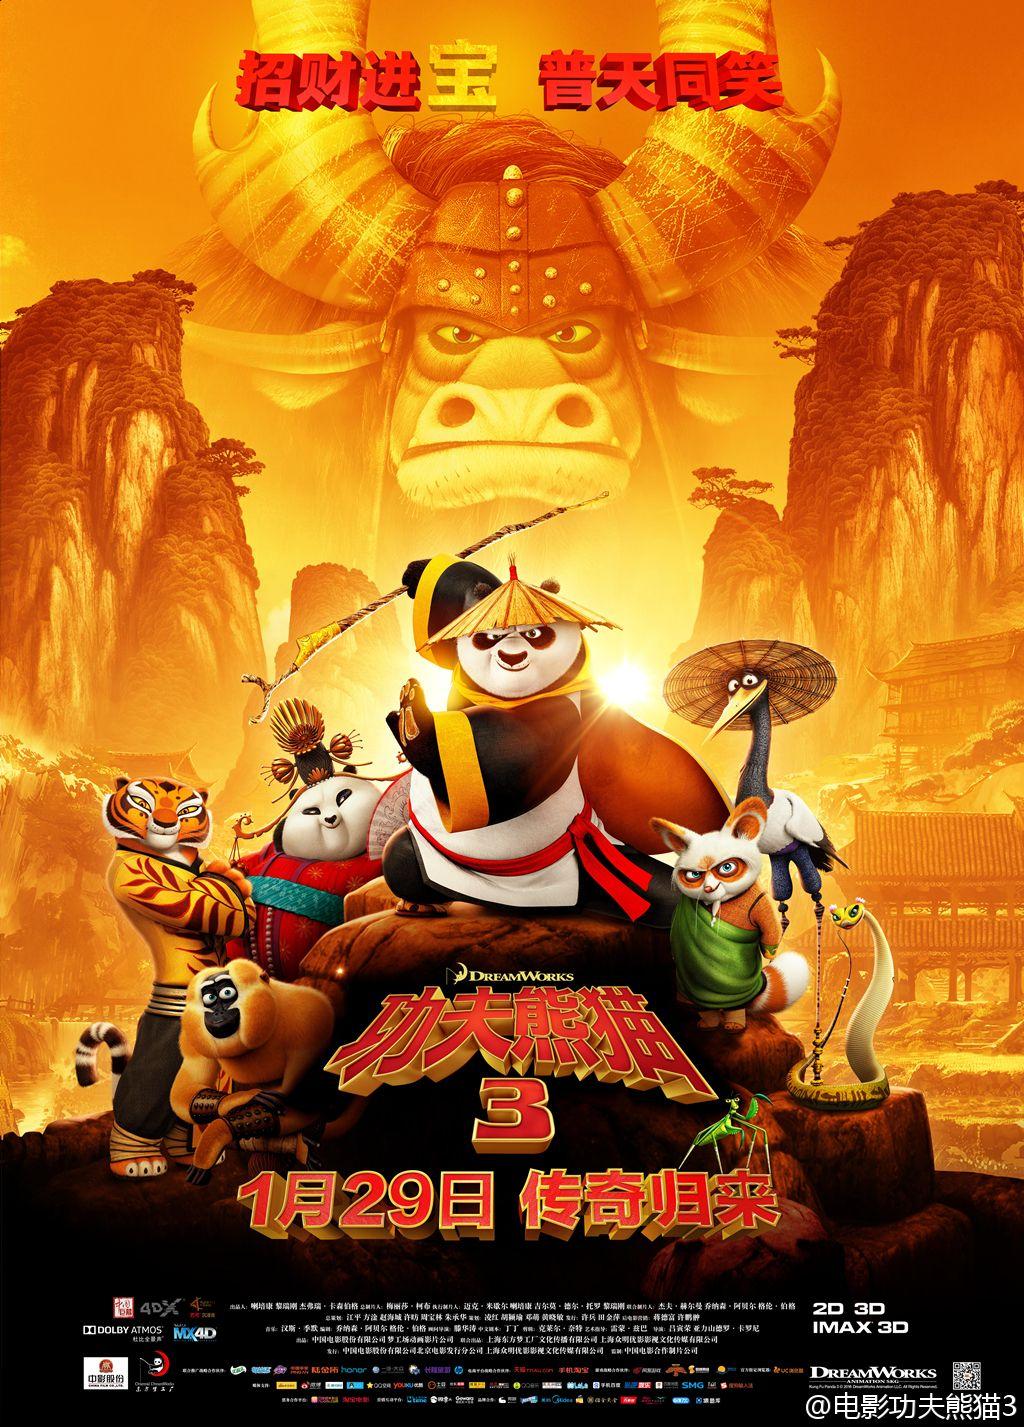 New Chinese Kung Fu Panda 3 Poster